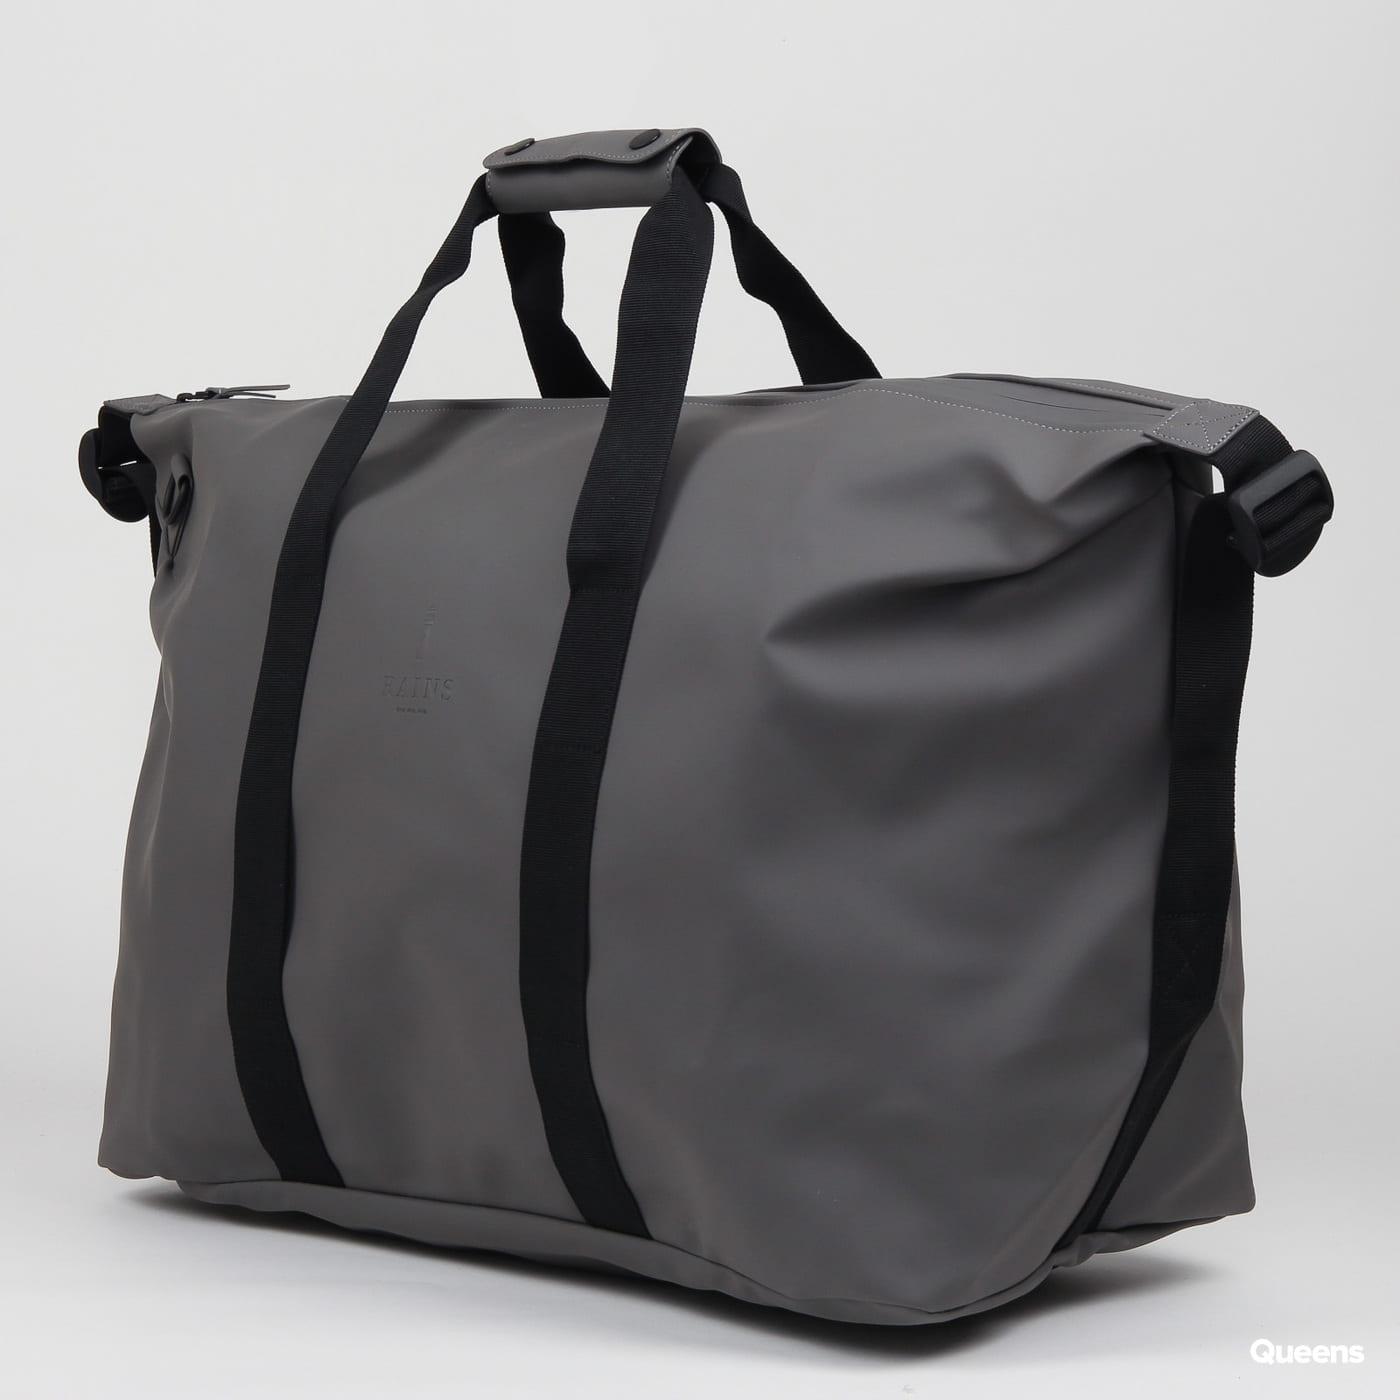 c236fb2bd Cestovní tašká Rains Weekend Bag (1320 18) – Queens 💚